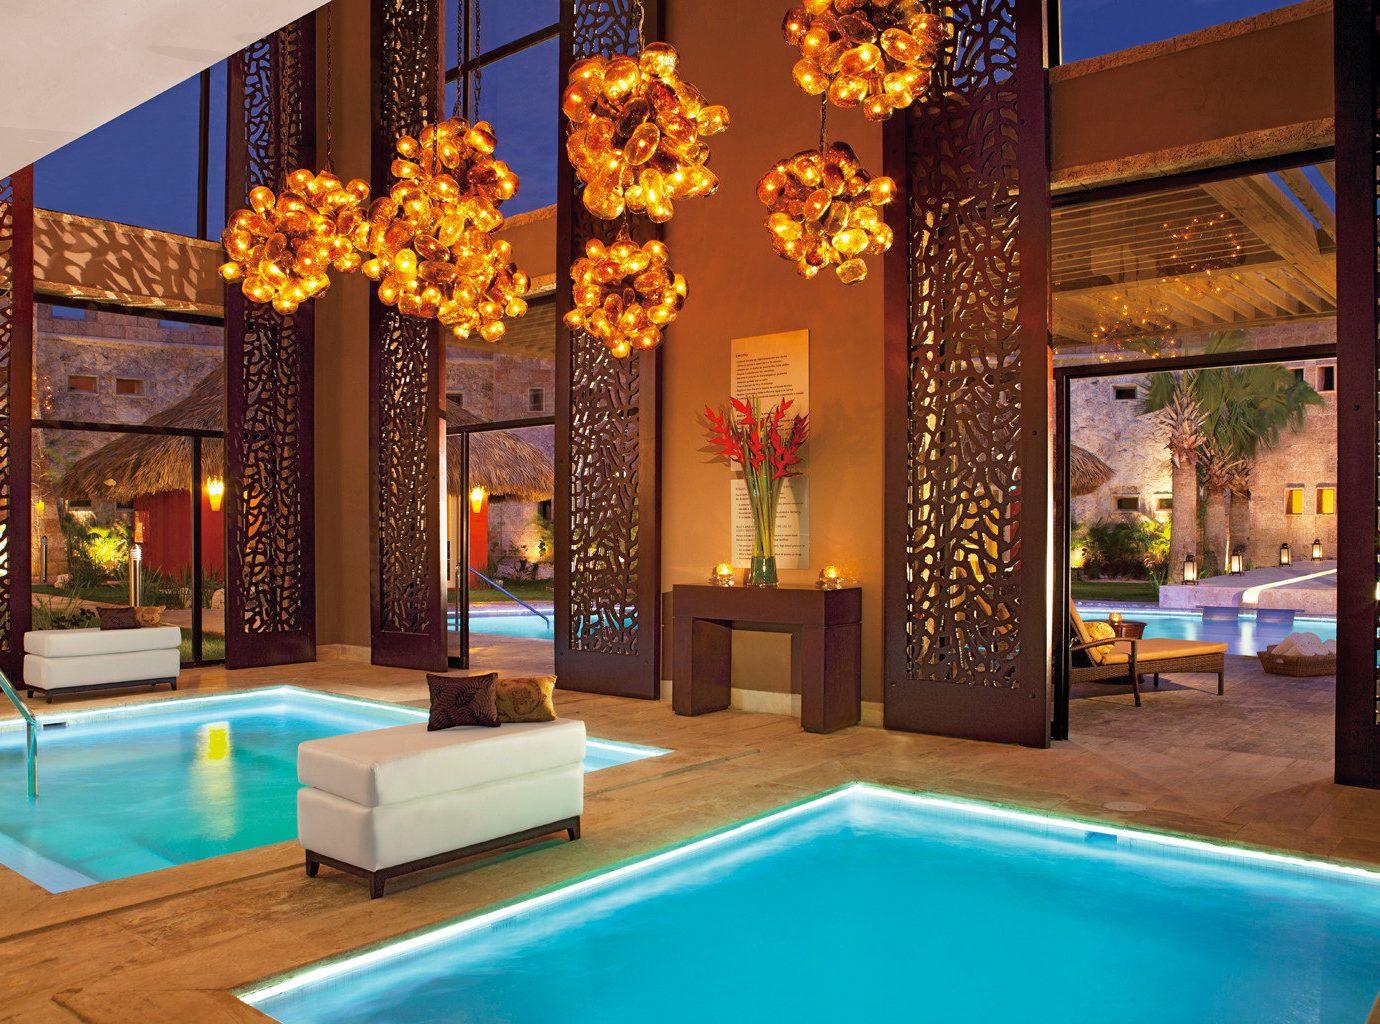 All-Inclusive Resorts Elegant Hot tub/Jacuzzi Hotels Luxury Modern Pool Romance indoor leisure swimming pool estate Resort Lobby interior design mansion blue Villa